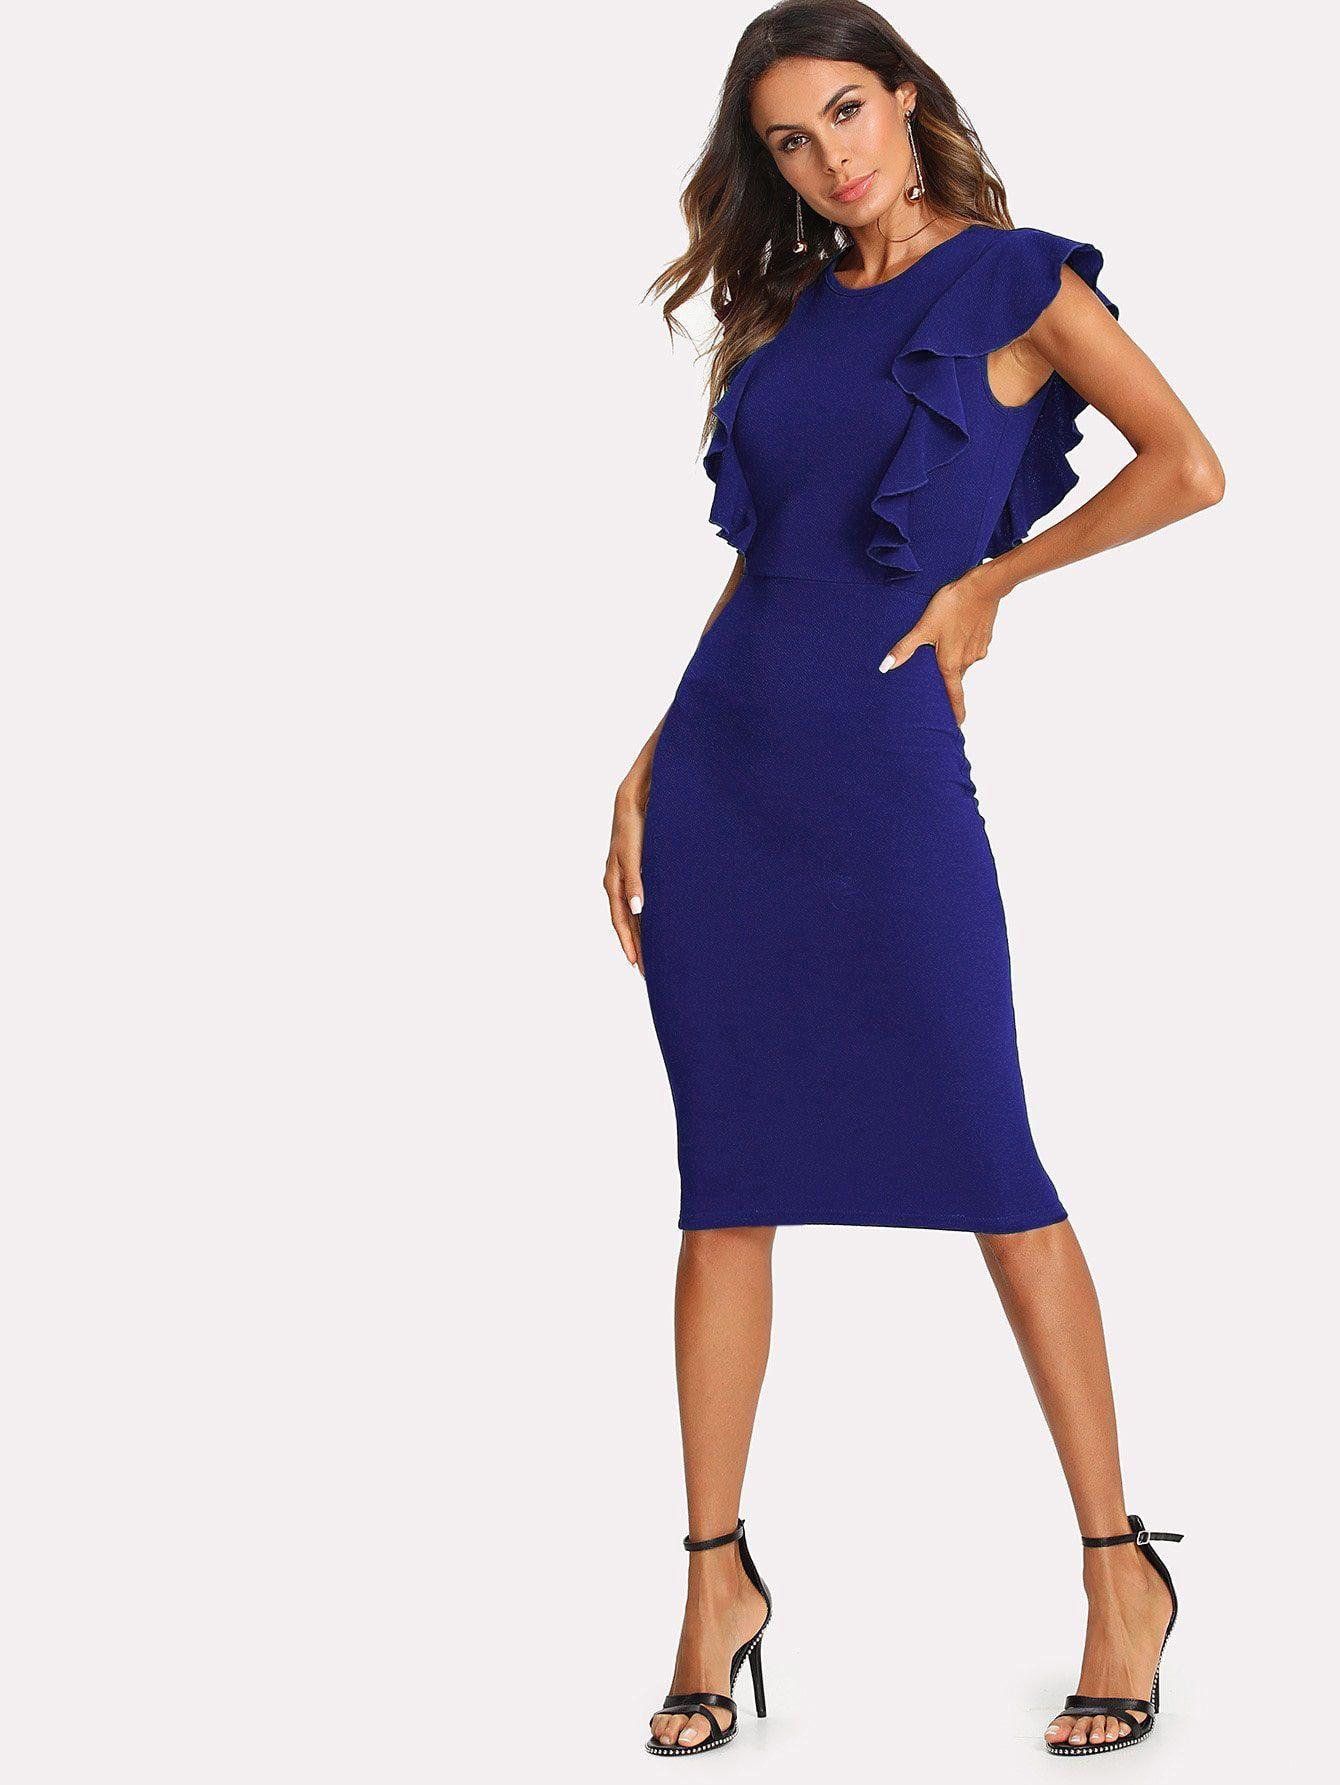 d884e84786 Elegant Pencil Ruffle and Zipper Plain Bodycon Round Neck Cap Sleeve  Butterfly Sleeve Natural Blue Knee Length Ruffle Trim Form Fitting Dress